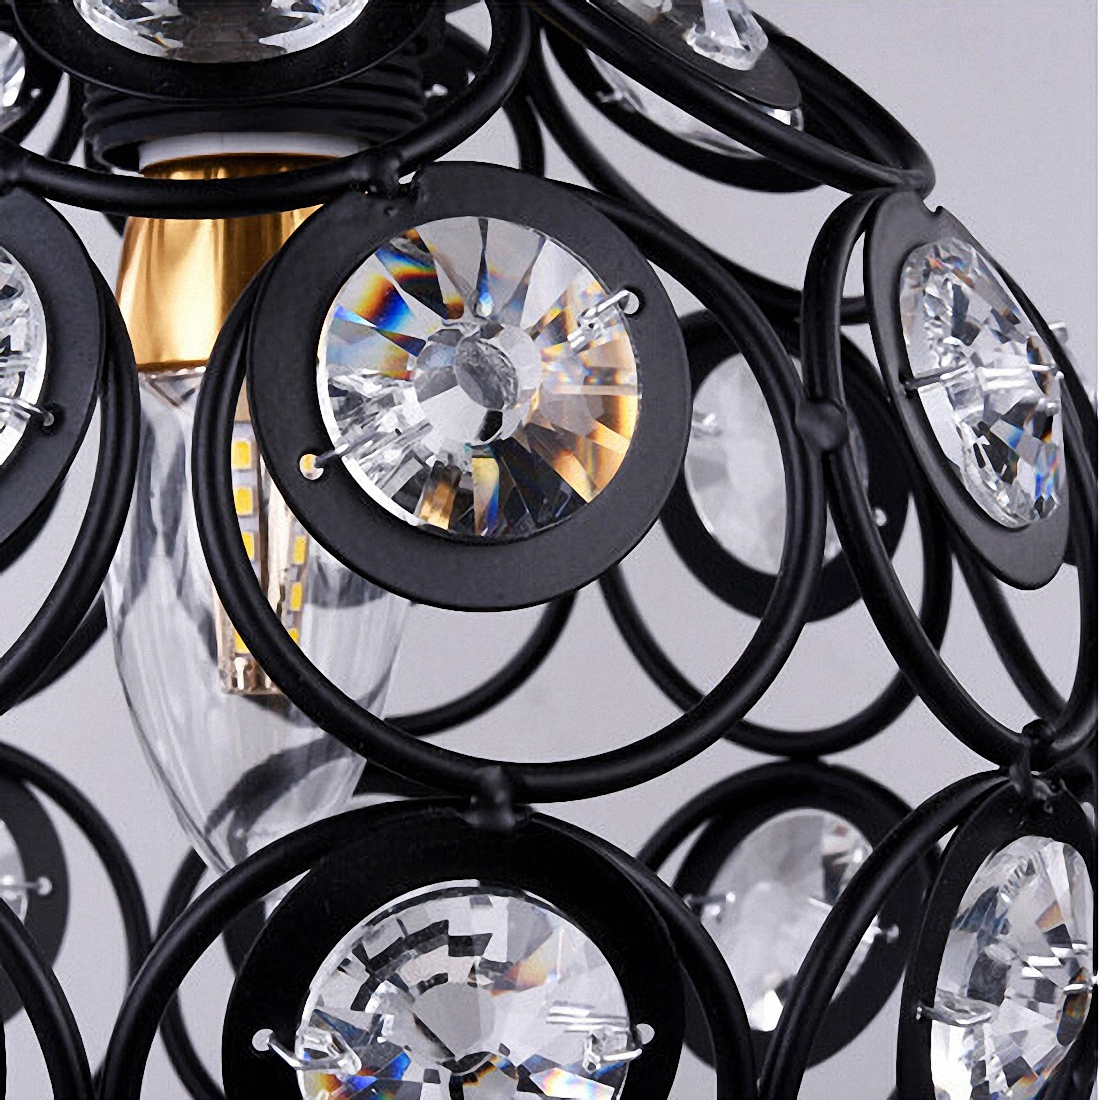 HTB1ahbMcSCWBuNjy0Fhq6z6EVXah E27 black Creative crystal minimalist ceiling light Single wall ceiling lamp bedroom lamp Single European iron lamp Crystal la